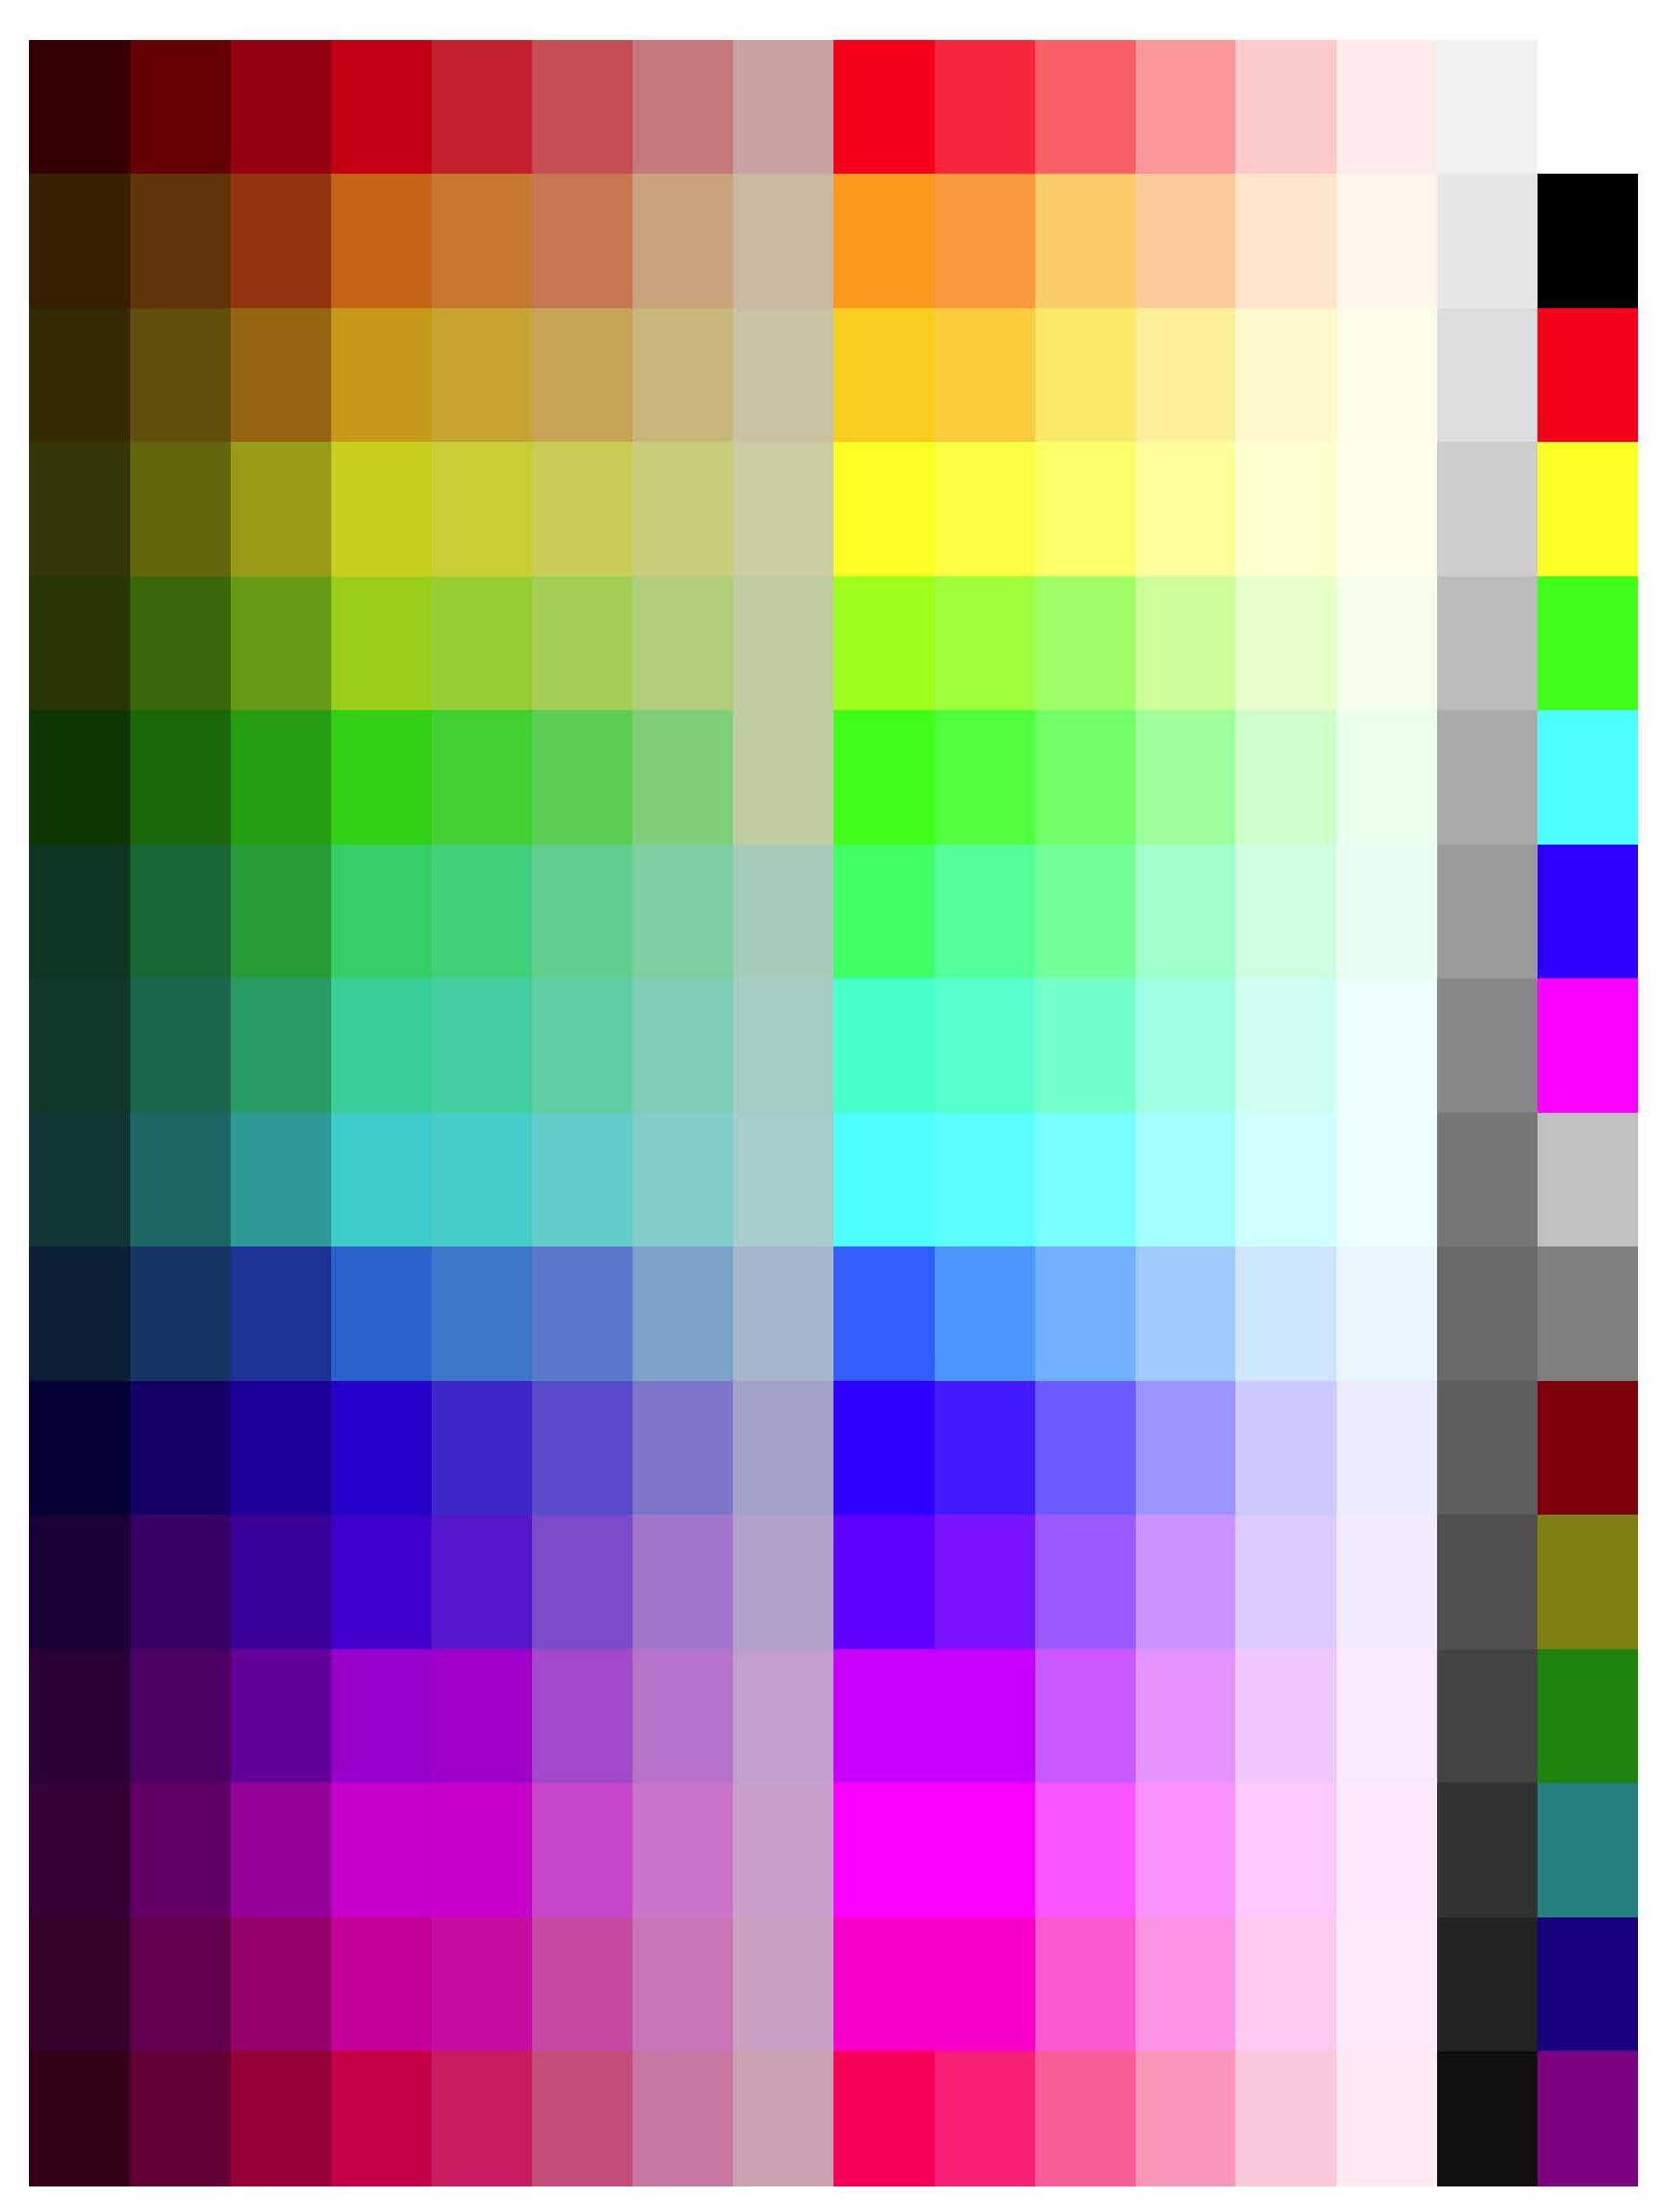 256color.jpg